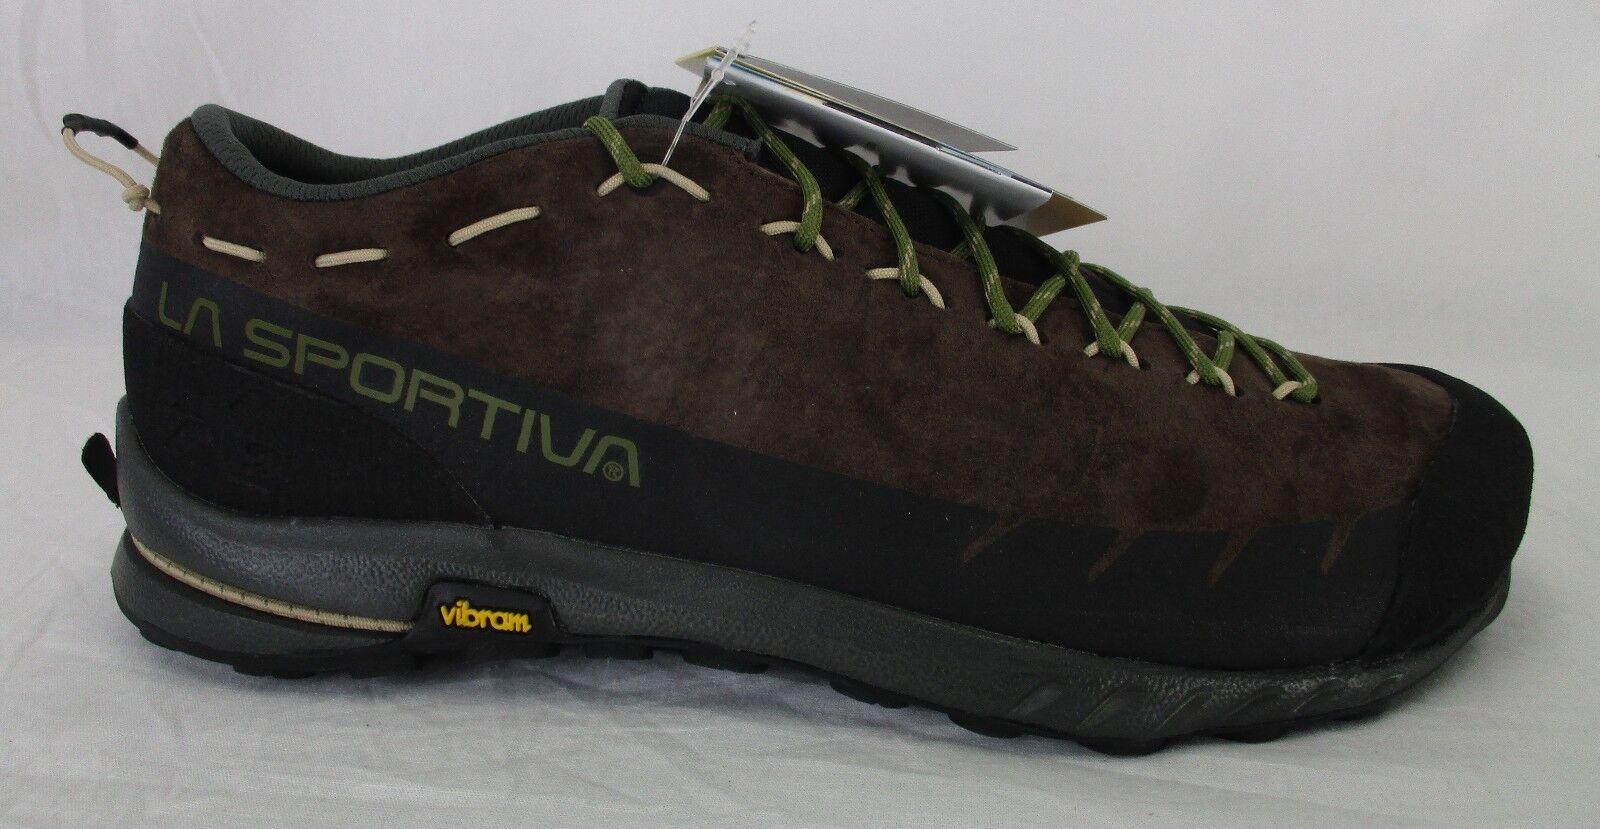 La Sportiva Mens TX2 Leather Climbing Shoes 27G Chocolate/Avocado Size 45.5